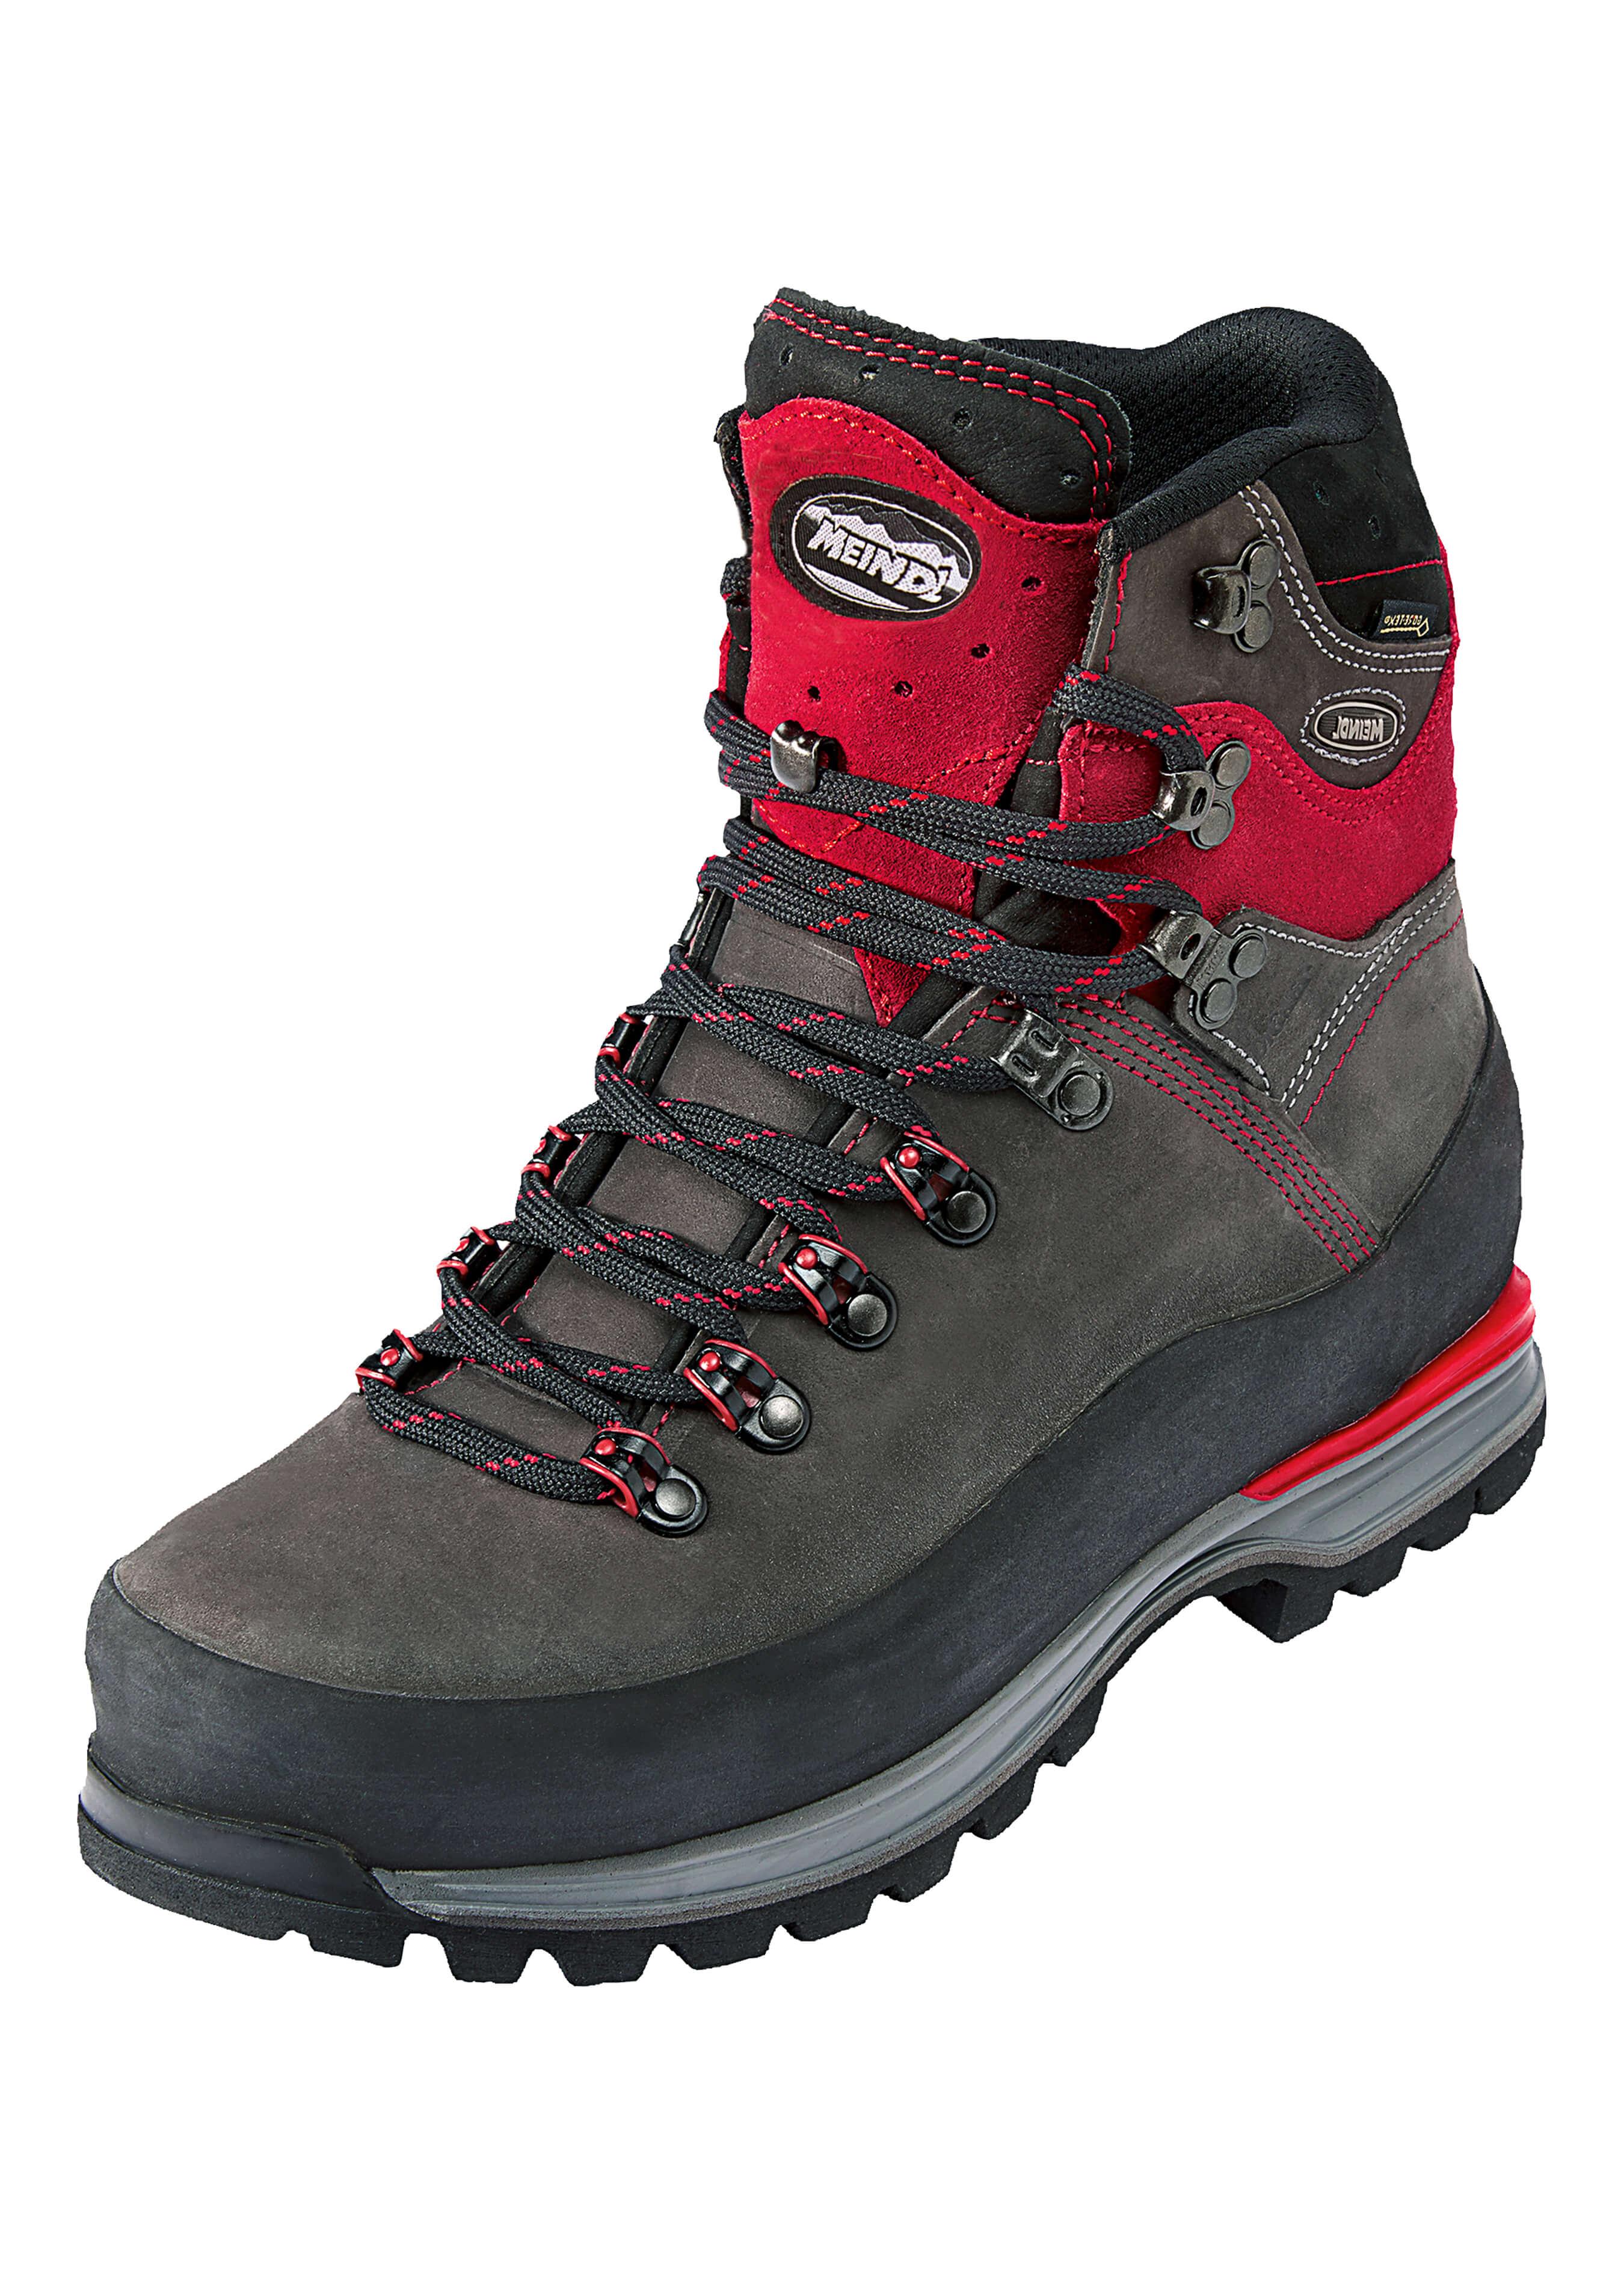 Chaussure de montagne Island MFS alpin 41571210 1